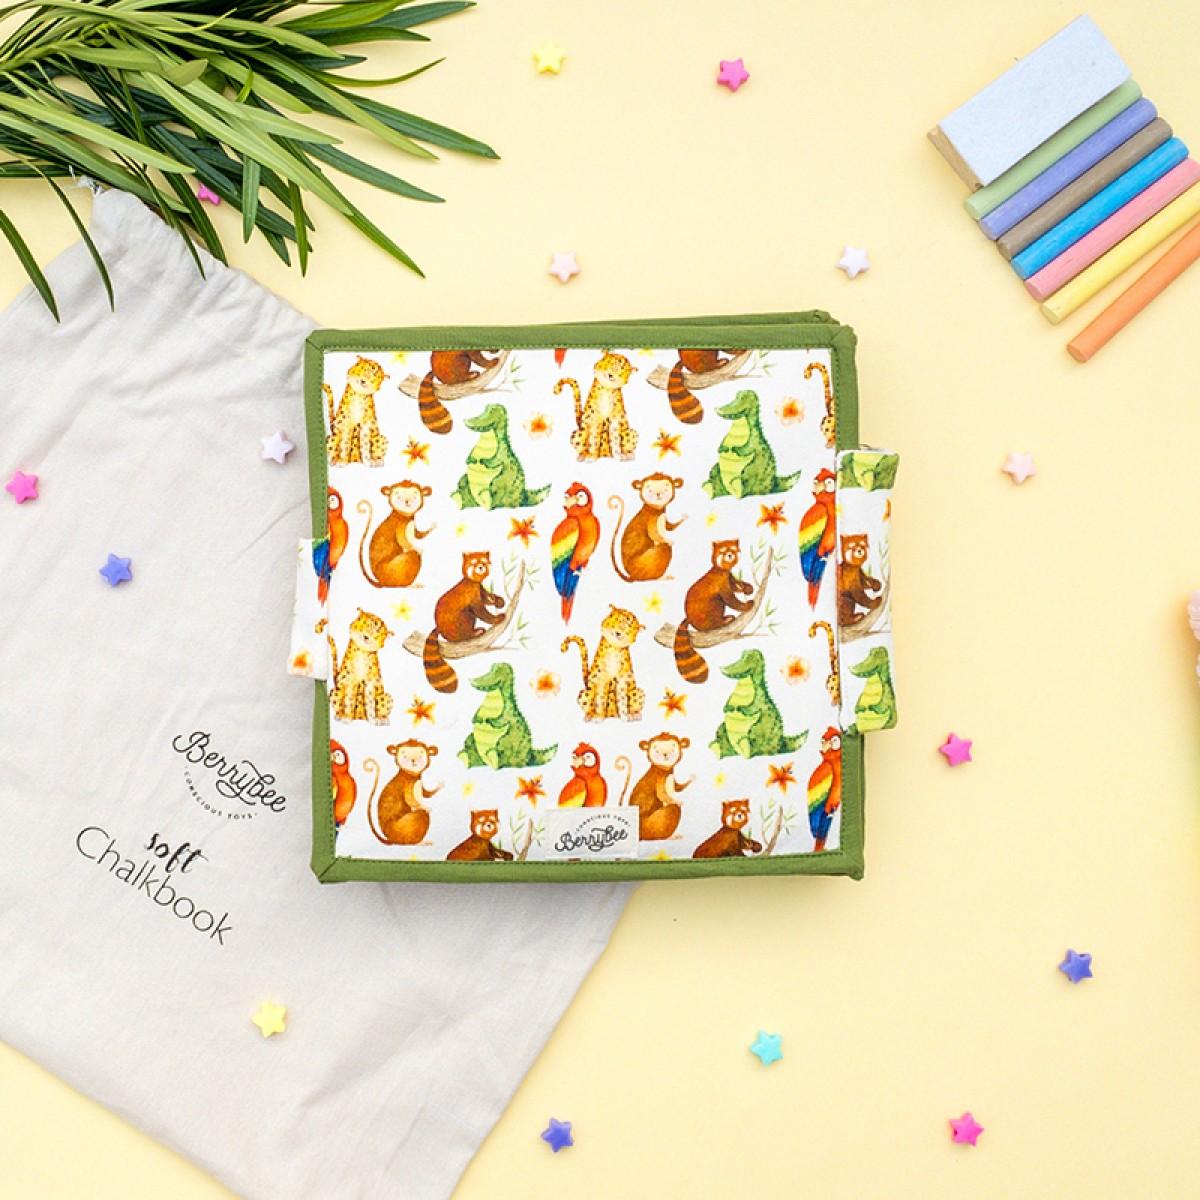 Animal Soft Chalkbook